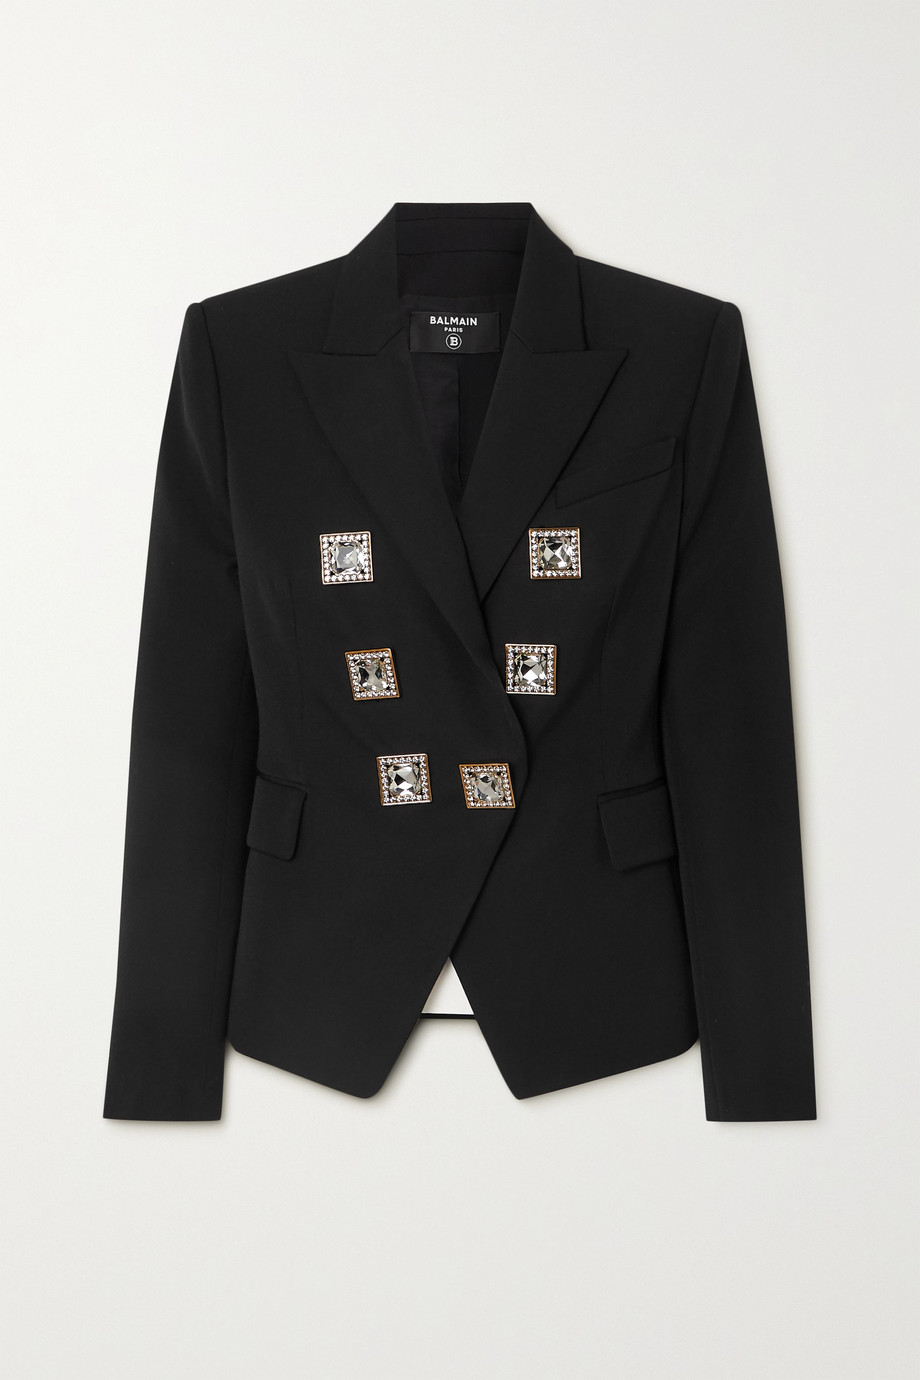 Balmain Double-breasted crystal-embellished grain de poudre wool blazer